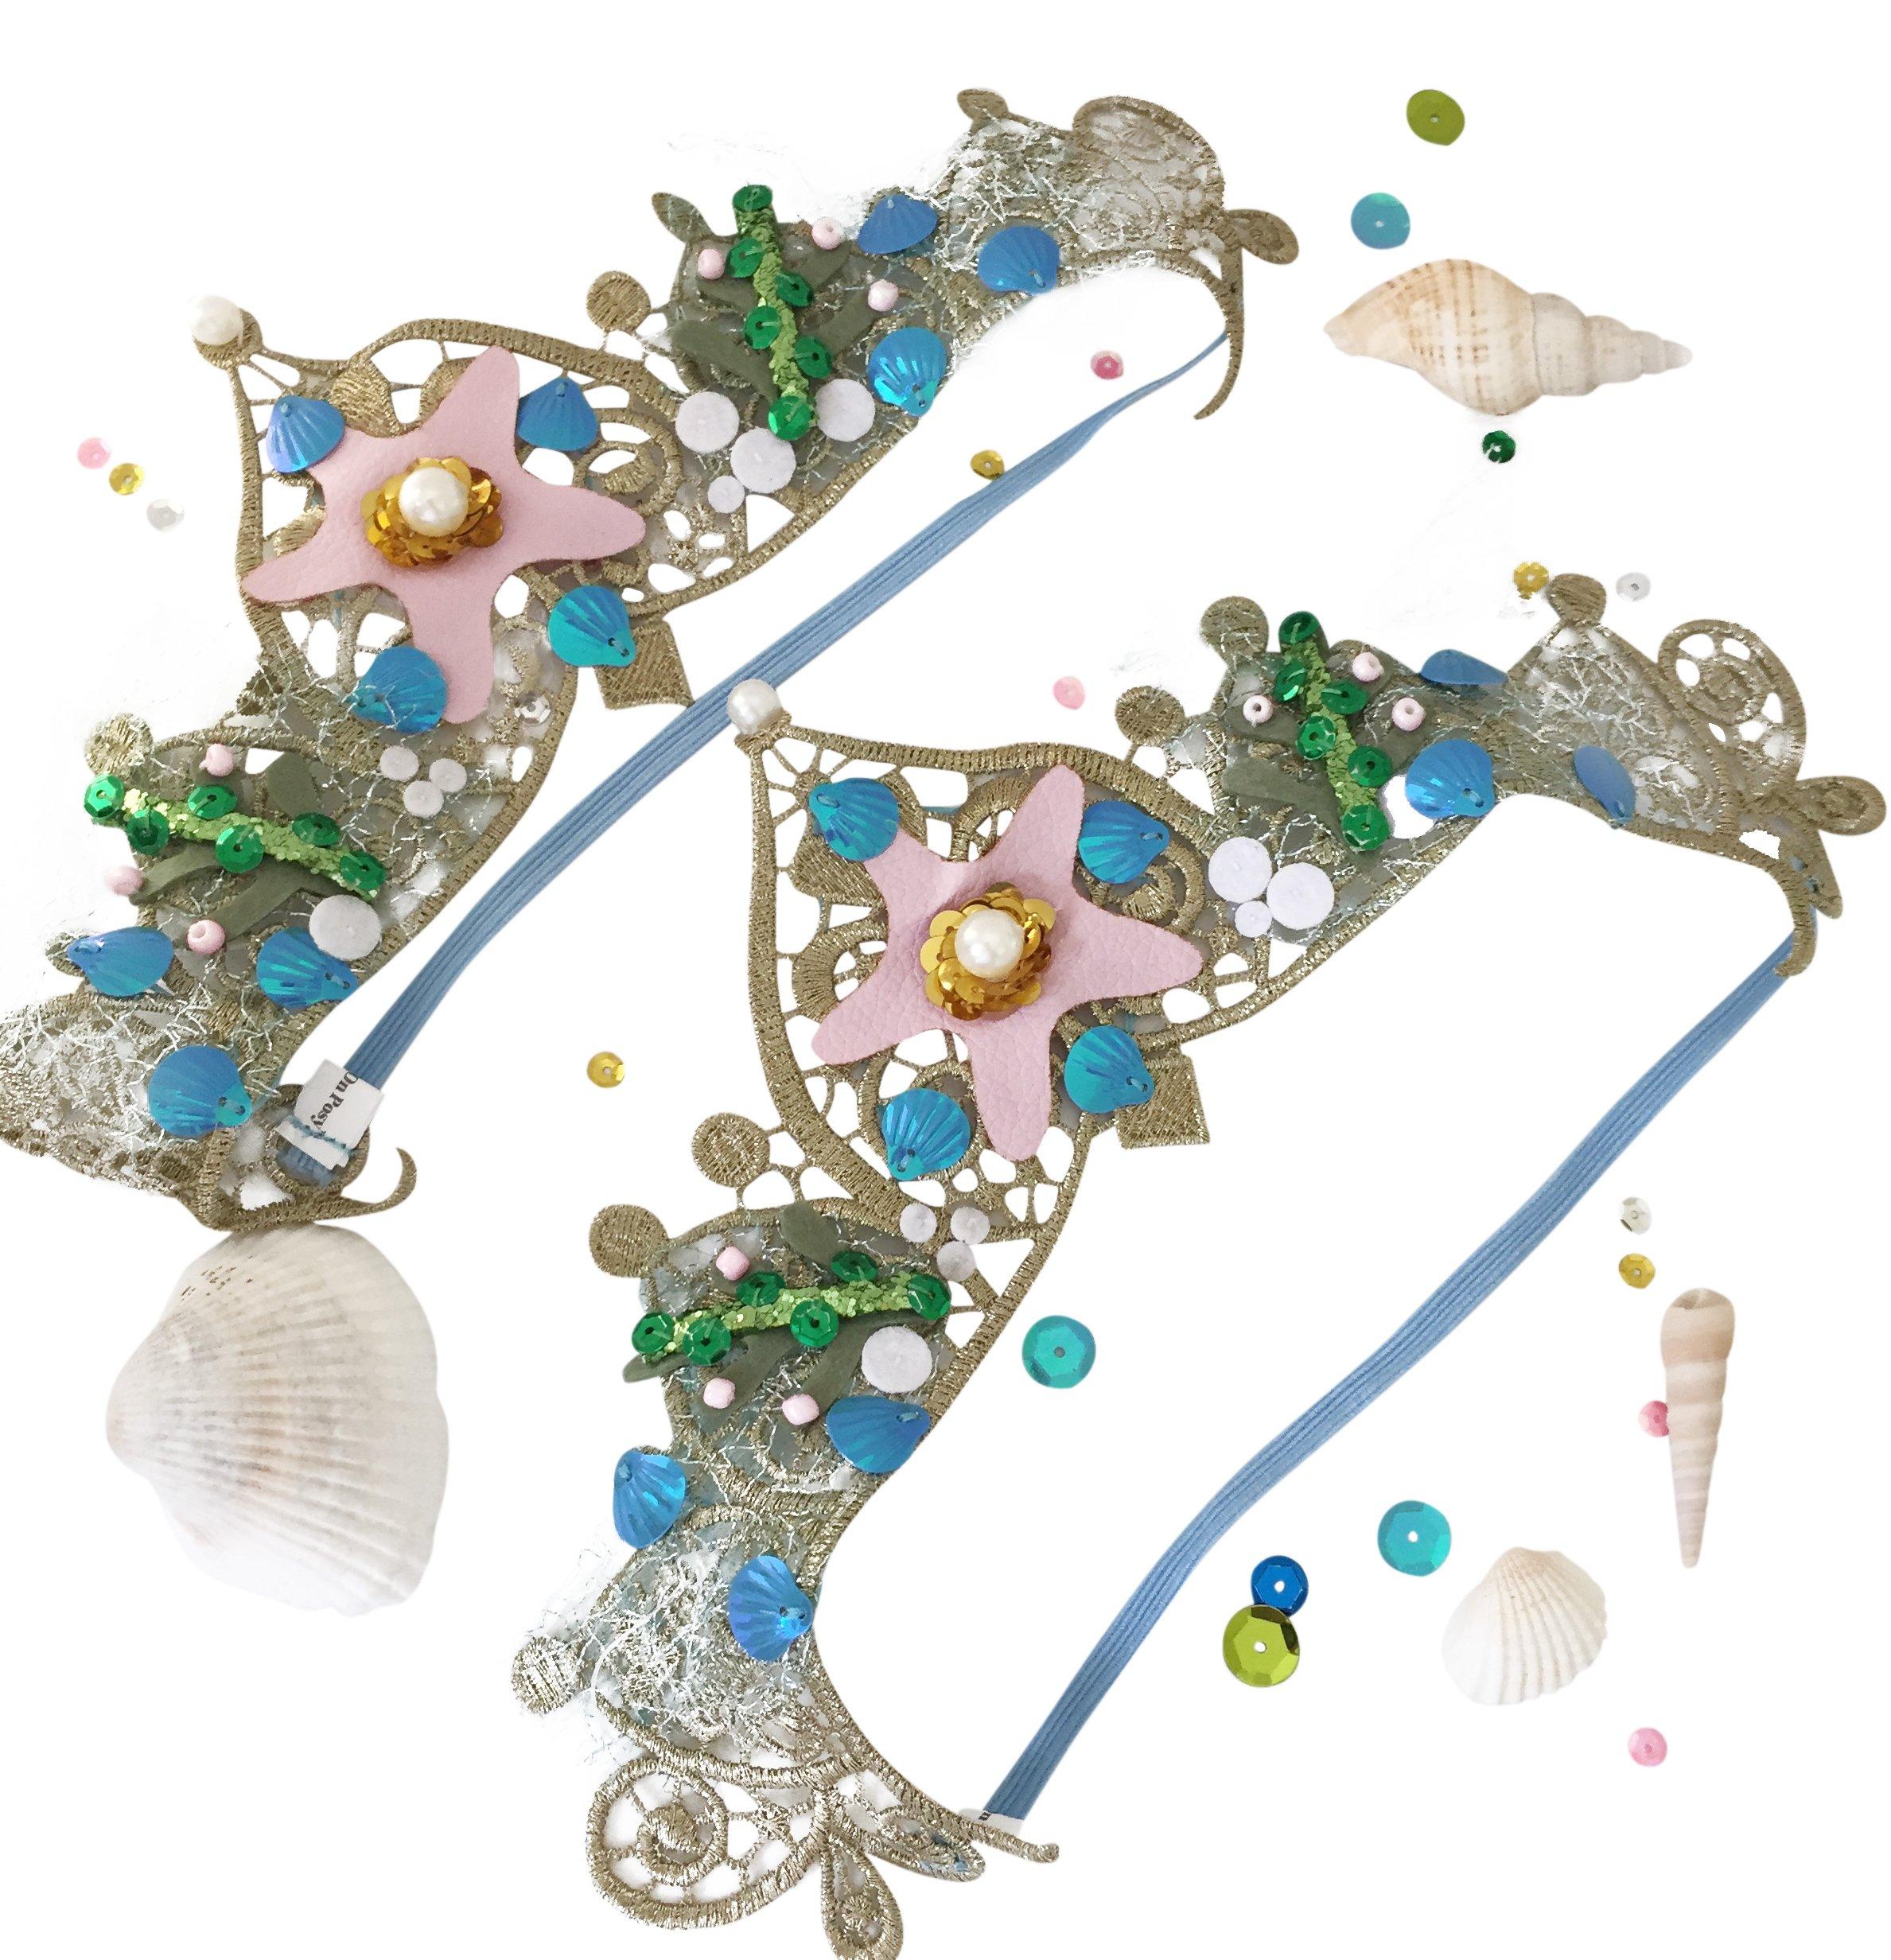 Mermaid Tiara Seashell Crowns for Girls Party Favors : Headband Birthday Party Favors for Kids Set of 8 Bulk Bundle